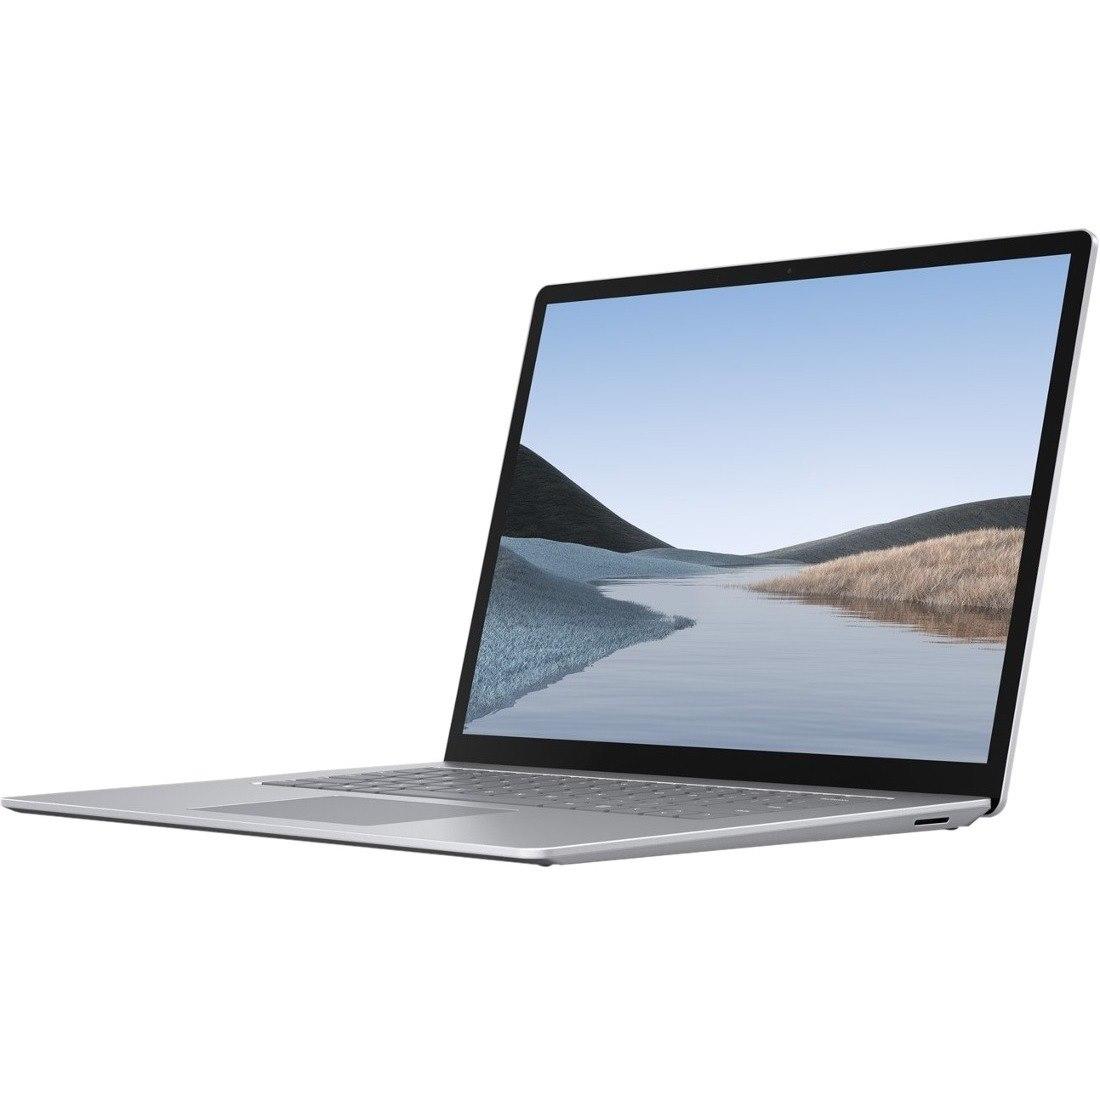 "Microsoft Surface Laptop 3 38.1 cm (15"") Touchscreen Notebook - 2496 x 1664 - Intel Core i7 (10th Gen) i7-1065G7 Quad-core (4 Core) 1.30 GHz - 16 GB RAM - 256 GB SSD - Platinum"